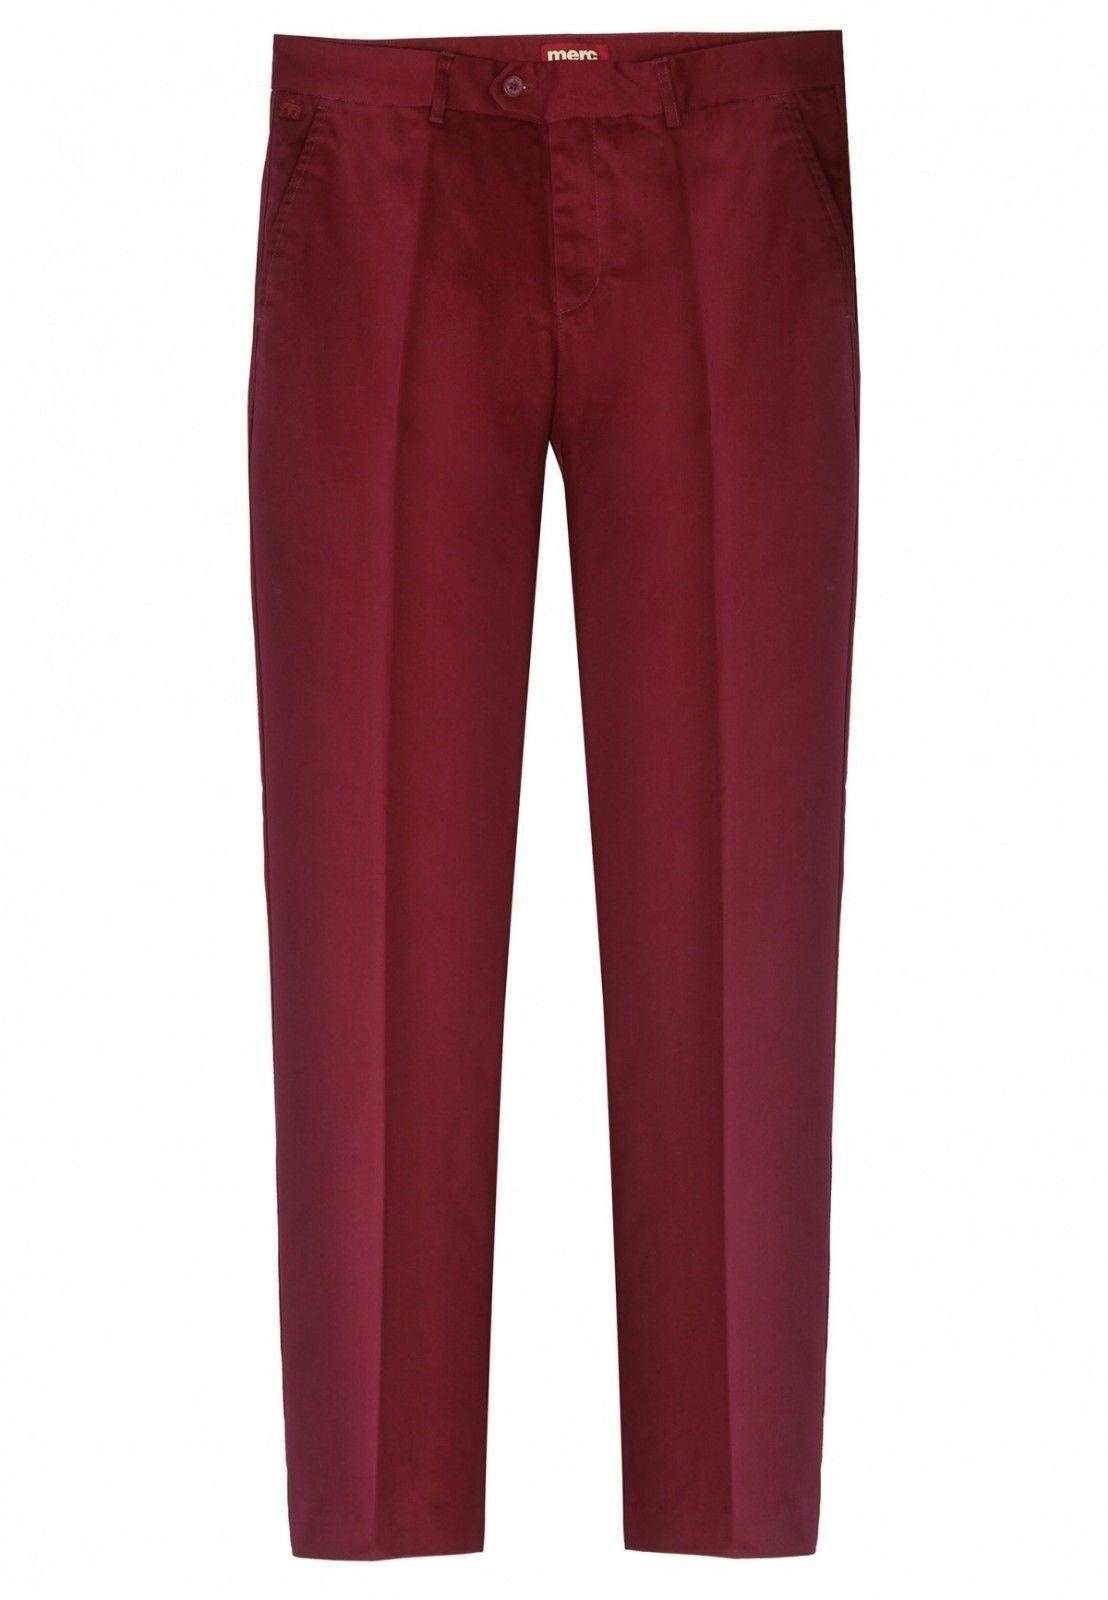 Merc London Hombre Mod Clásico Sta Prensa Pantalones Winston - Vino